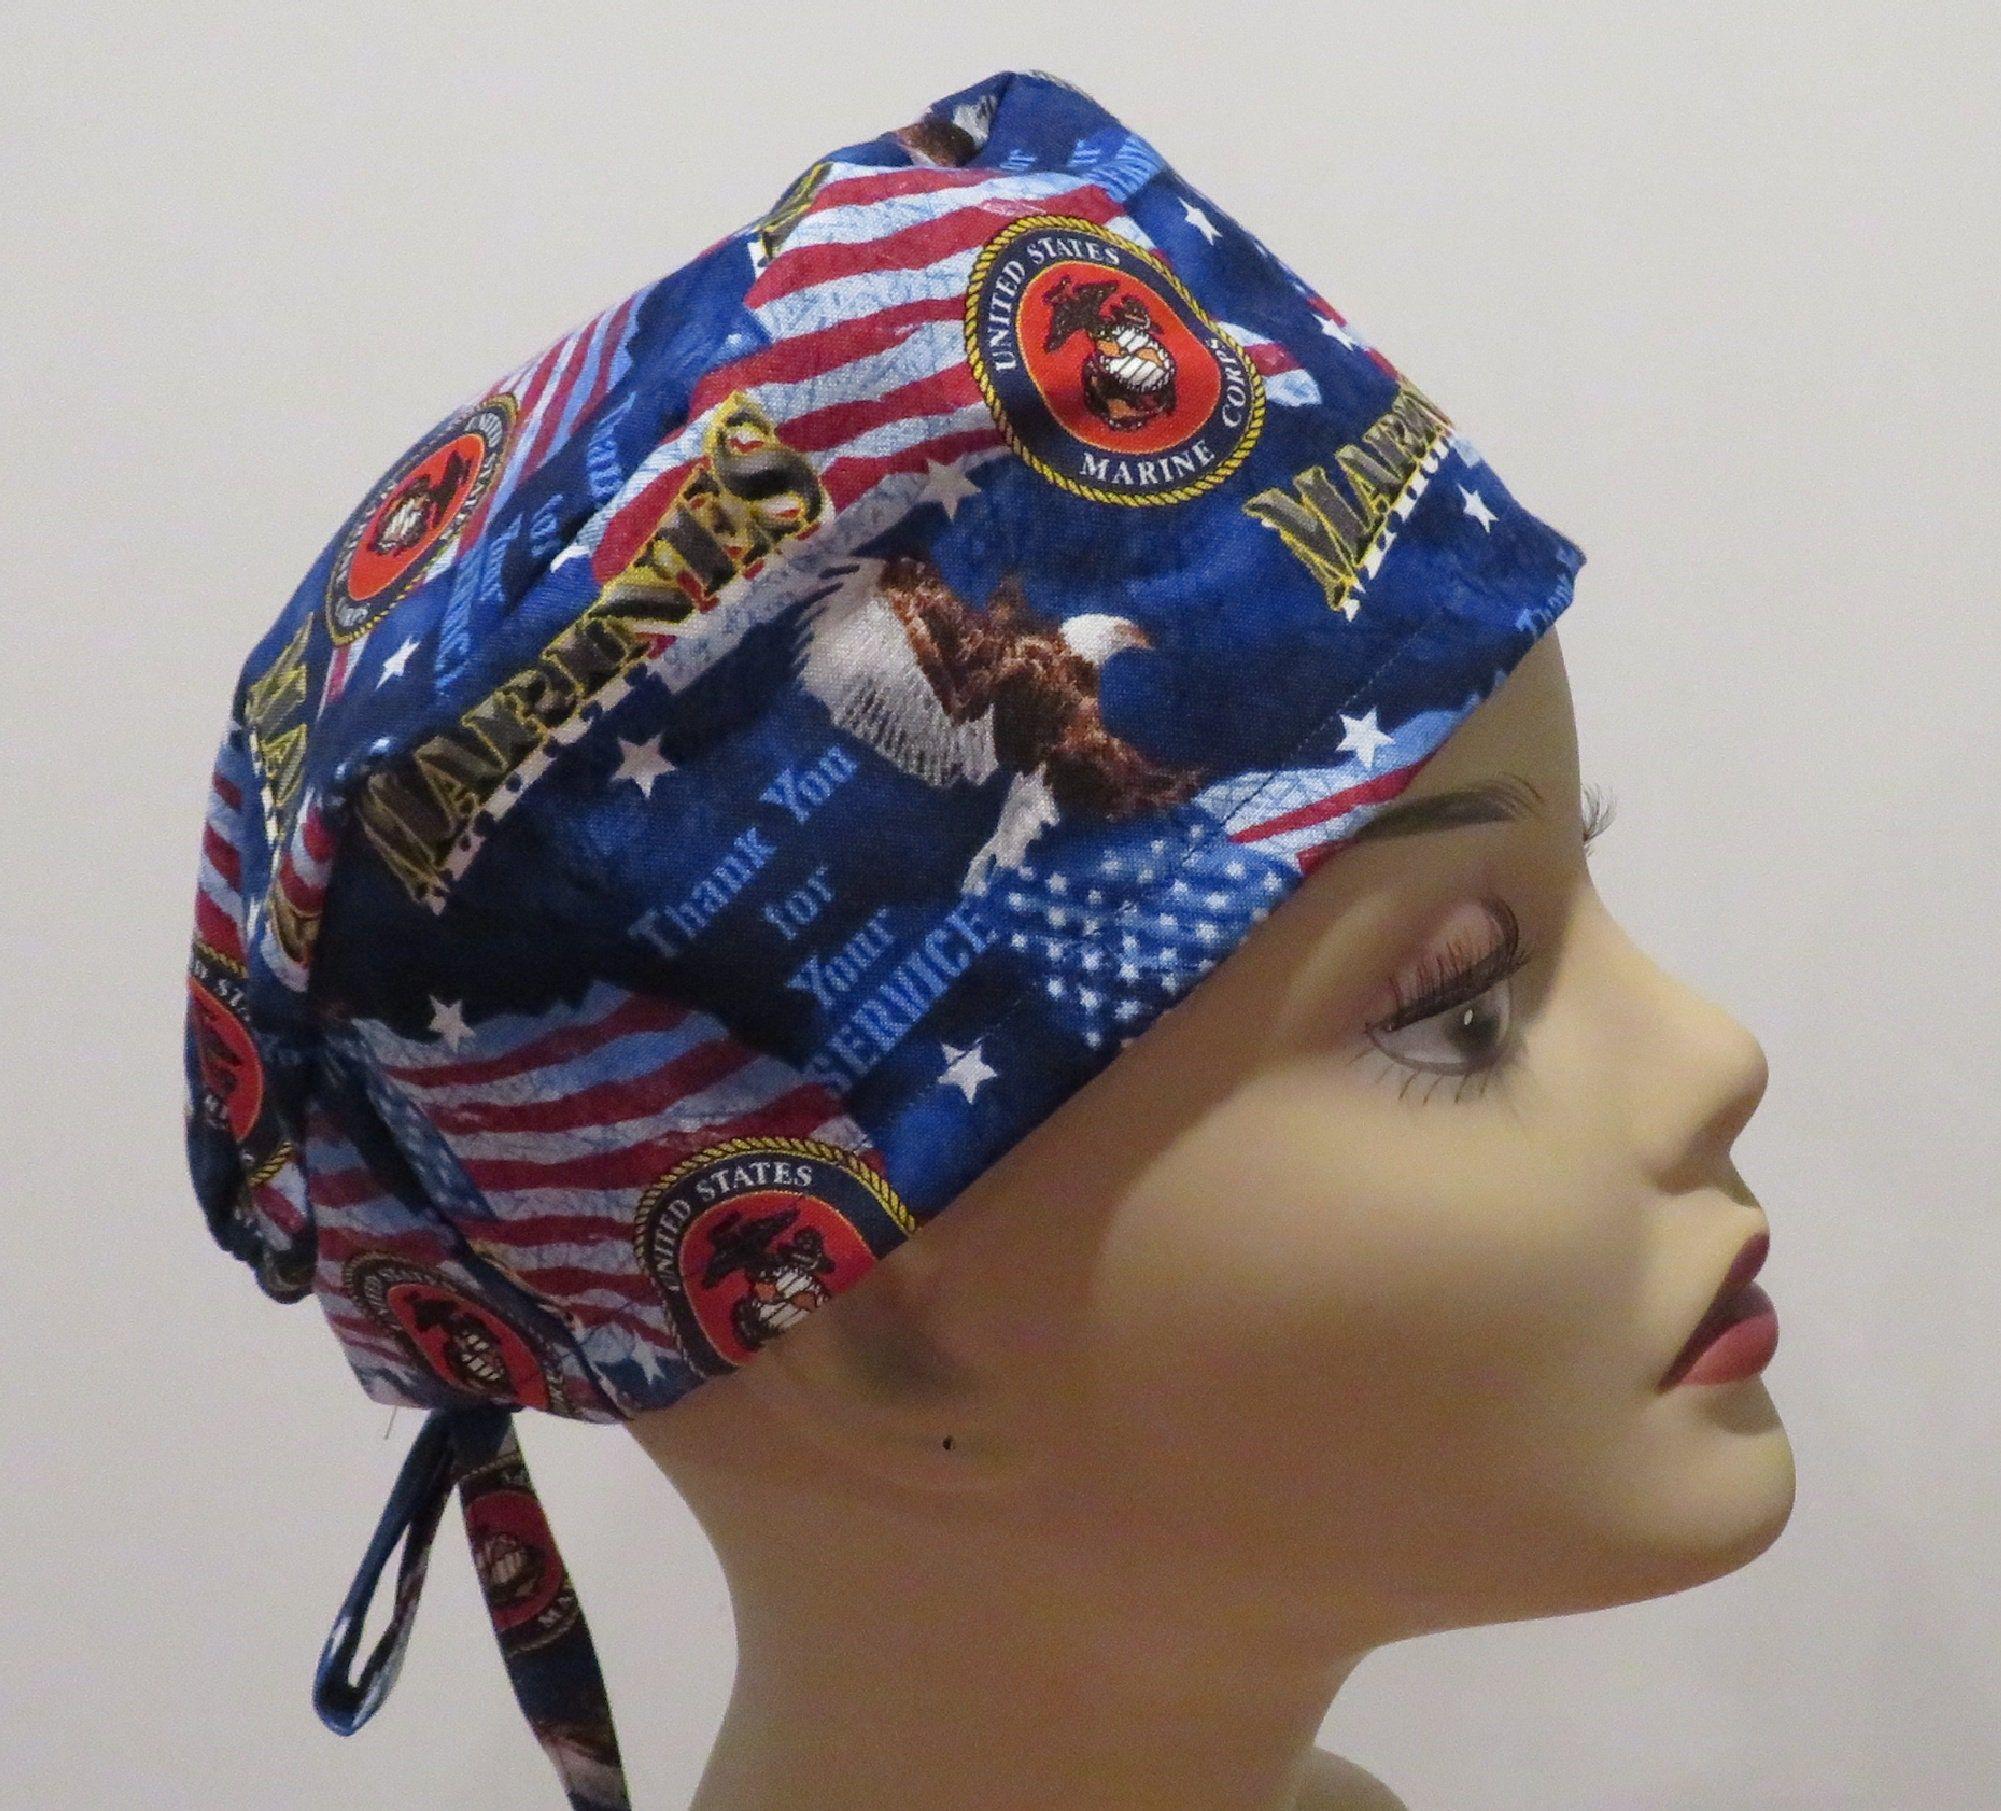 BRAVE fabric scrub hats, Tie back scrub hats, Skull scrub hats, Men scrub hats, Unisex scrub hats, Marines scrub hats, Patriotic hats